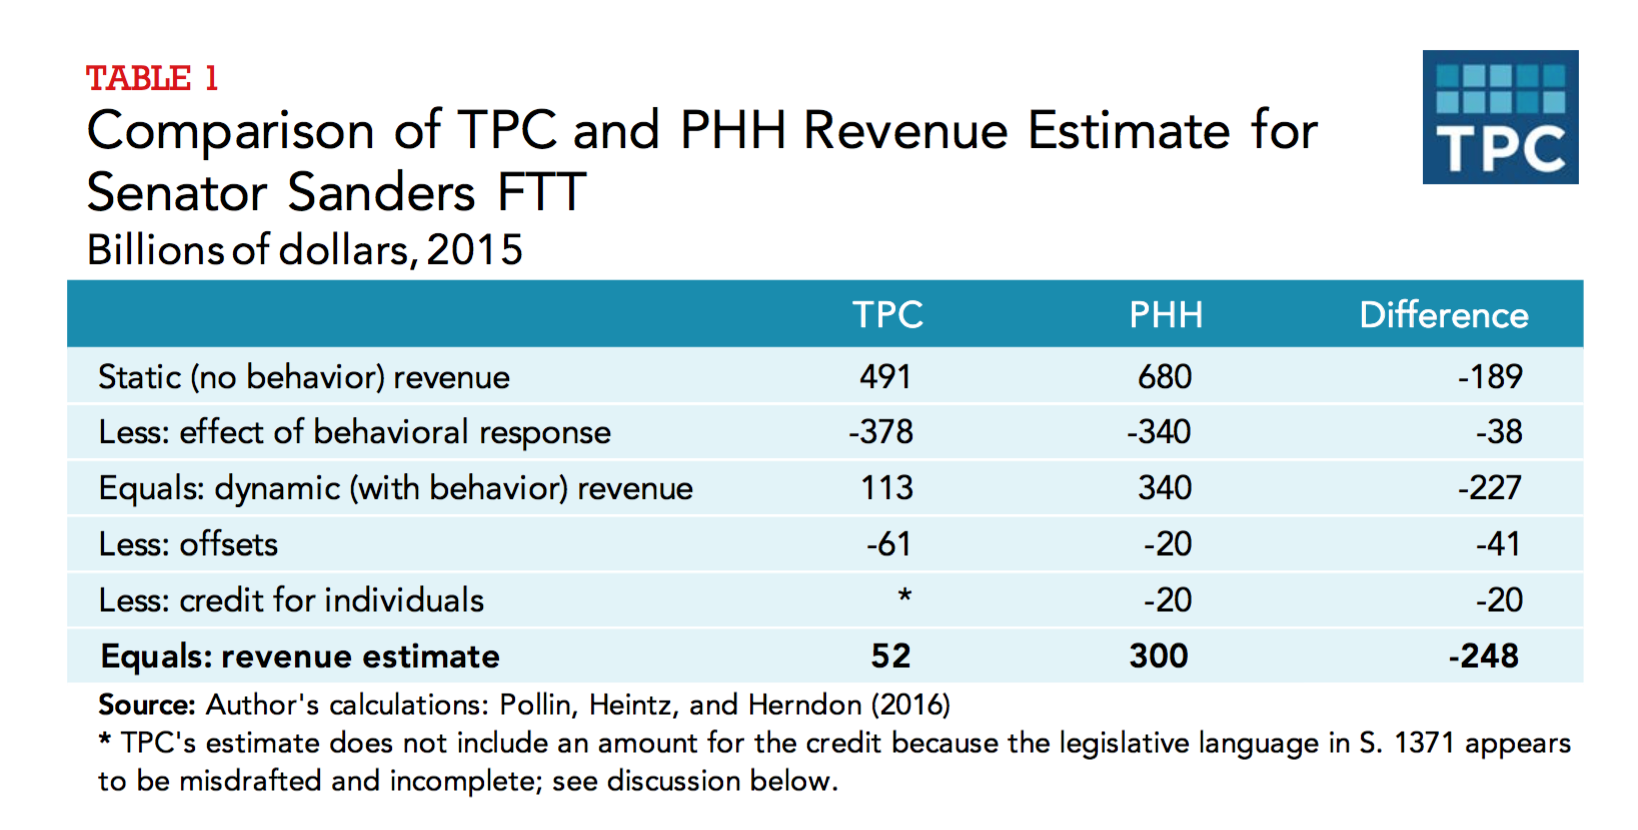 ...reducing revenue estimates from $300 billion a year, as Sanders estimates, to $52 billion a year.